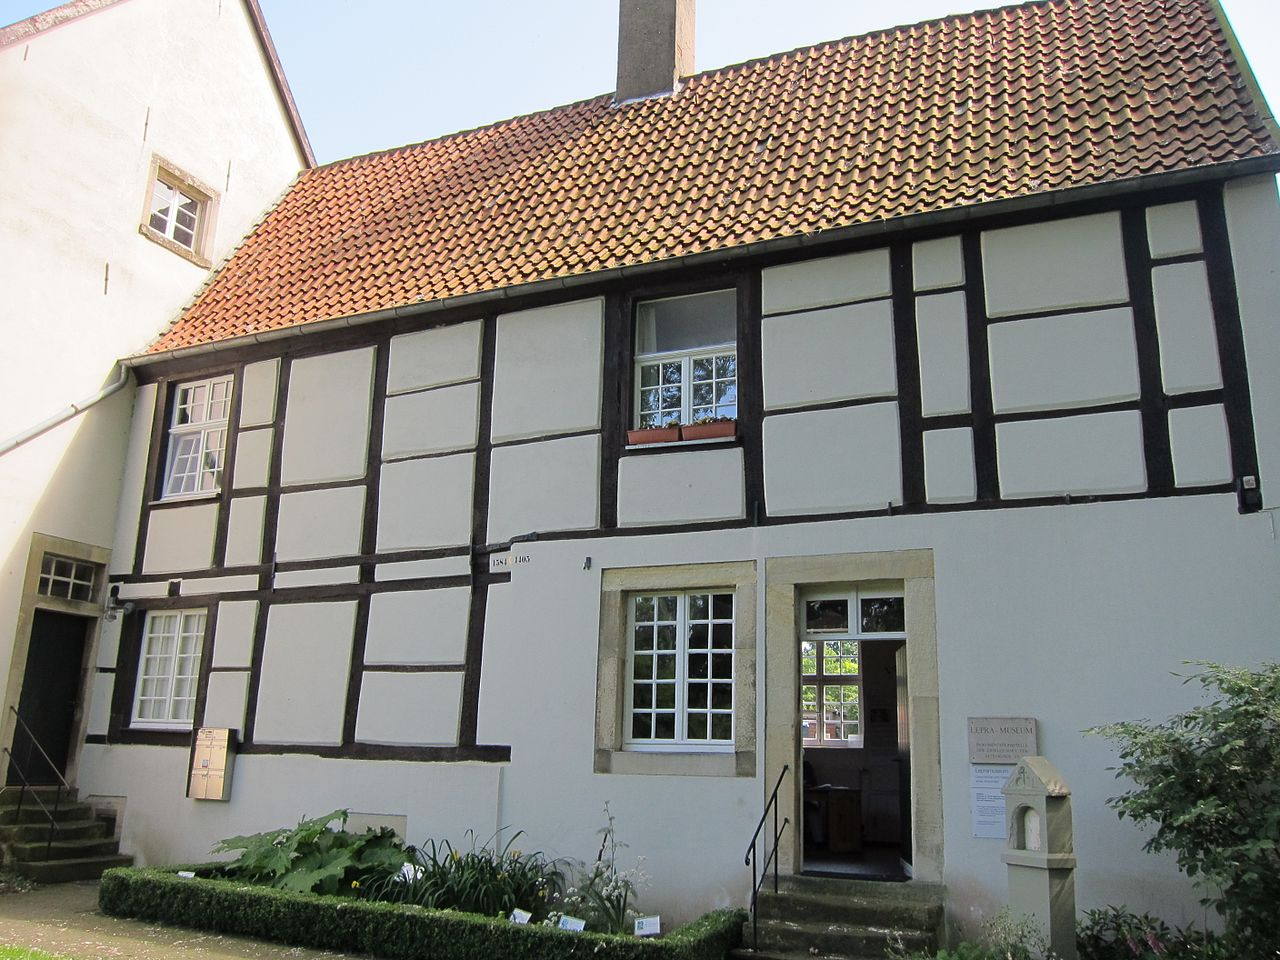 Bild Lepramuseum Münster